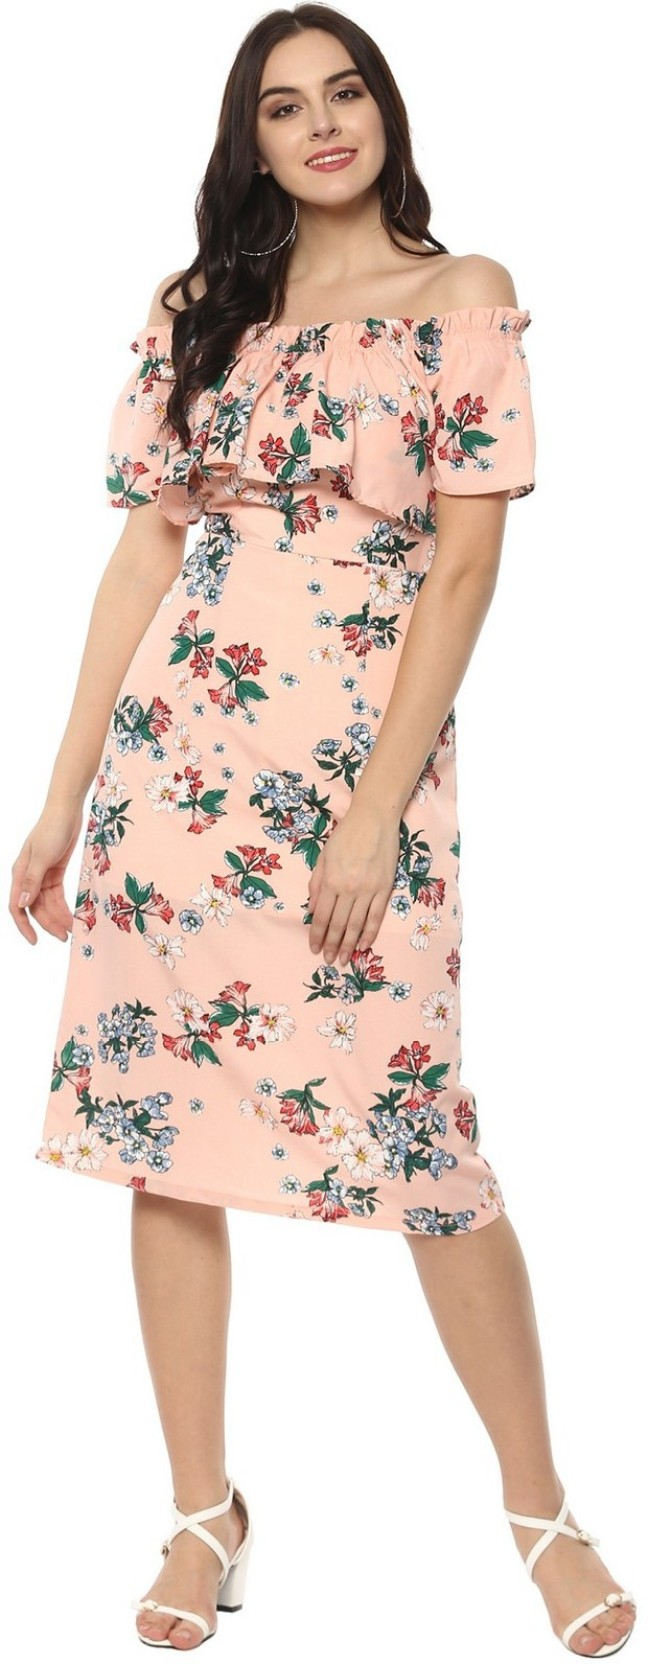 8d5ae494bb0050 Zima Leto Women s A-line Pink Dress - Buy Zima Leto Women s A-line ...